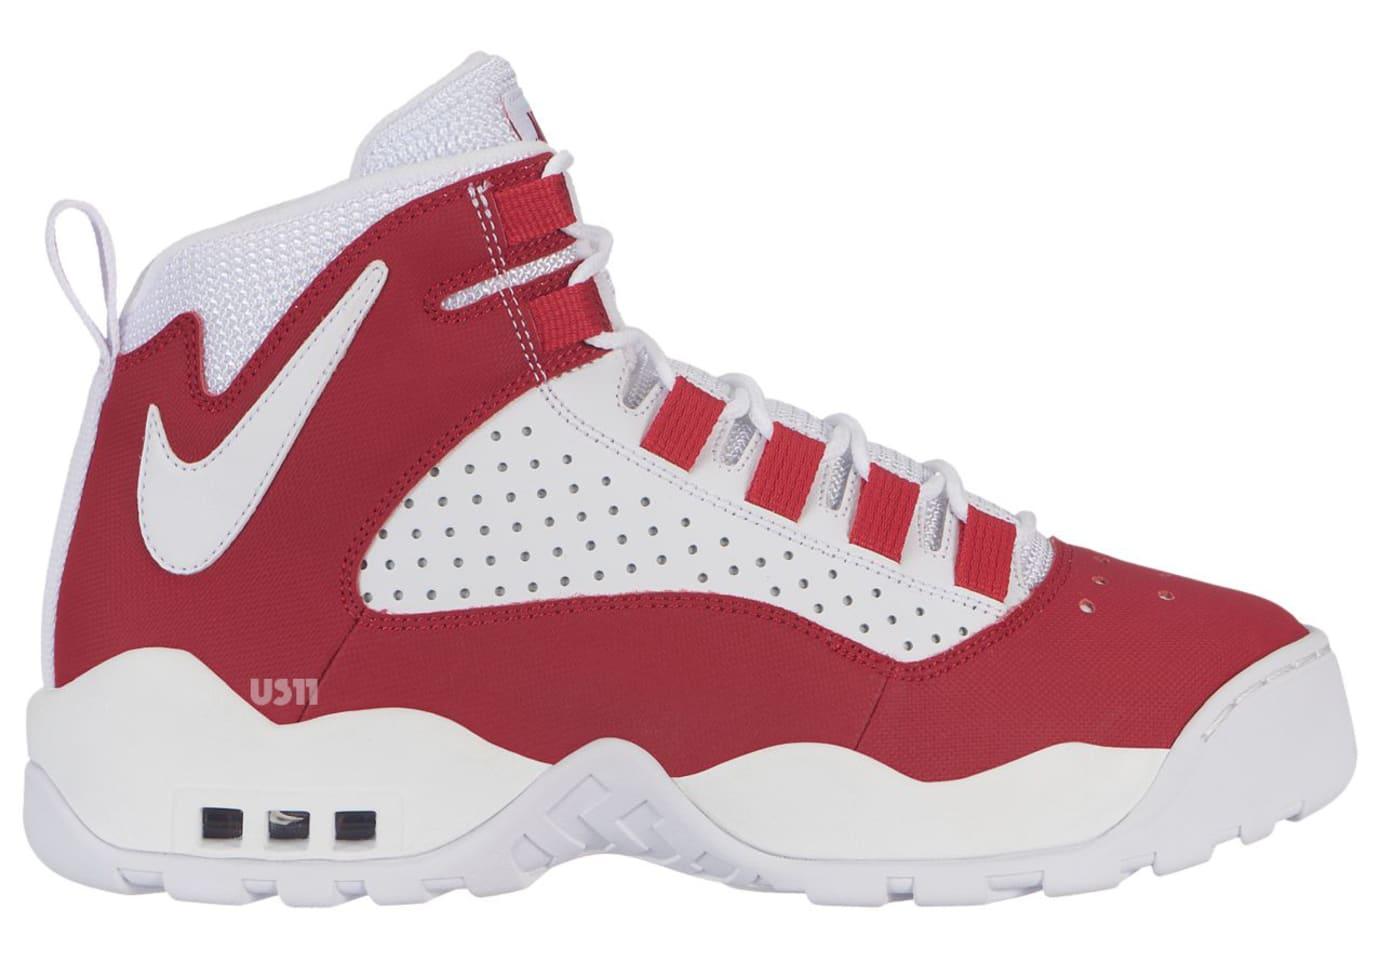 5b12582b0916 Nike May Be Bringing Back Dennis Rodman s Air Darwin